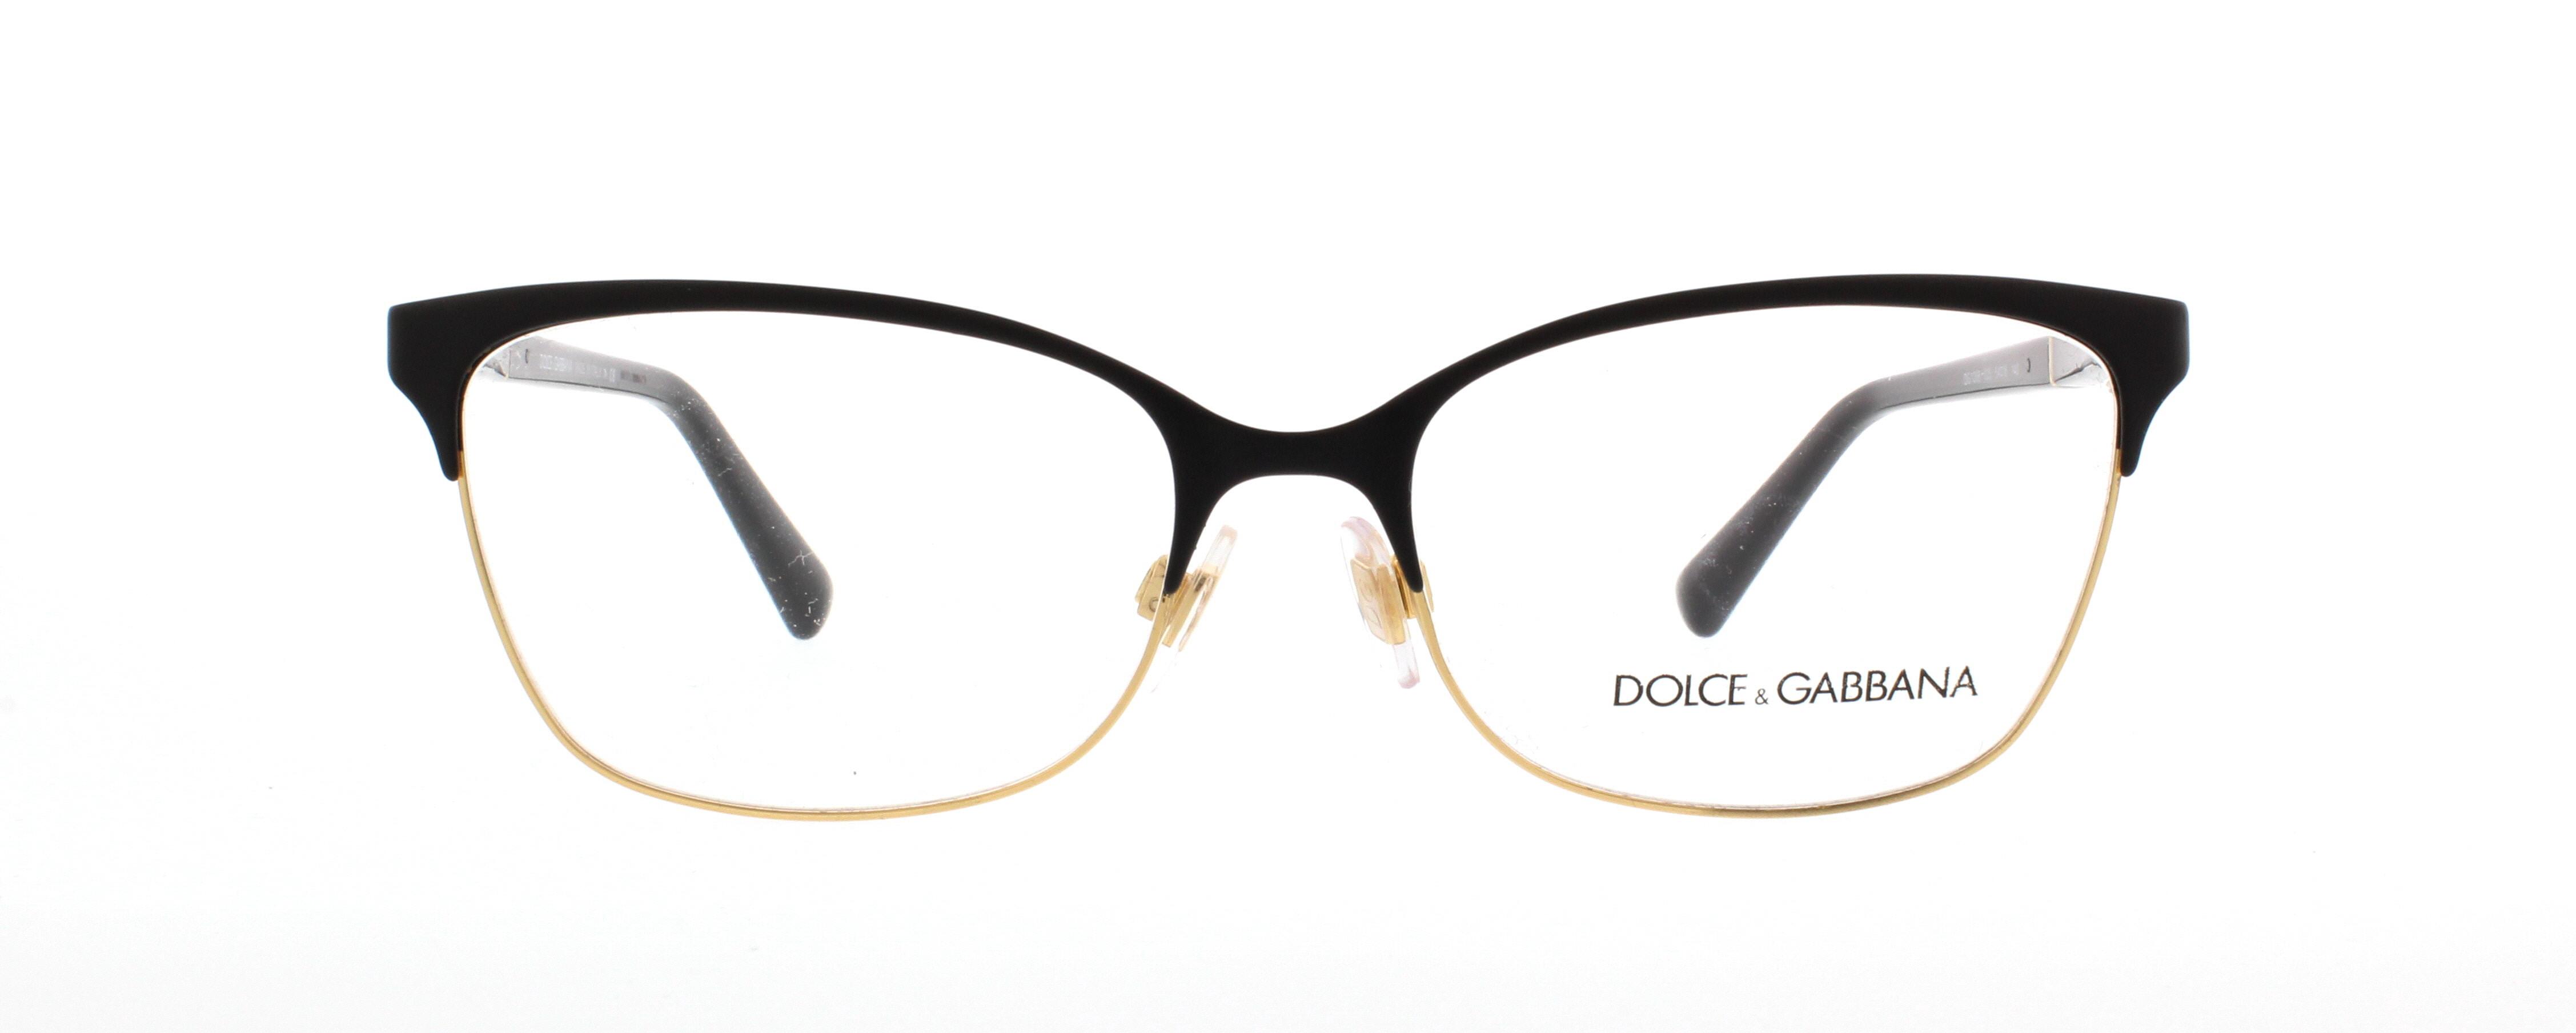 Designer Frames Outlet Dolce Gabbana DG - What is invoice processing online glasses store